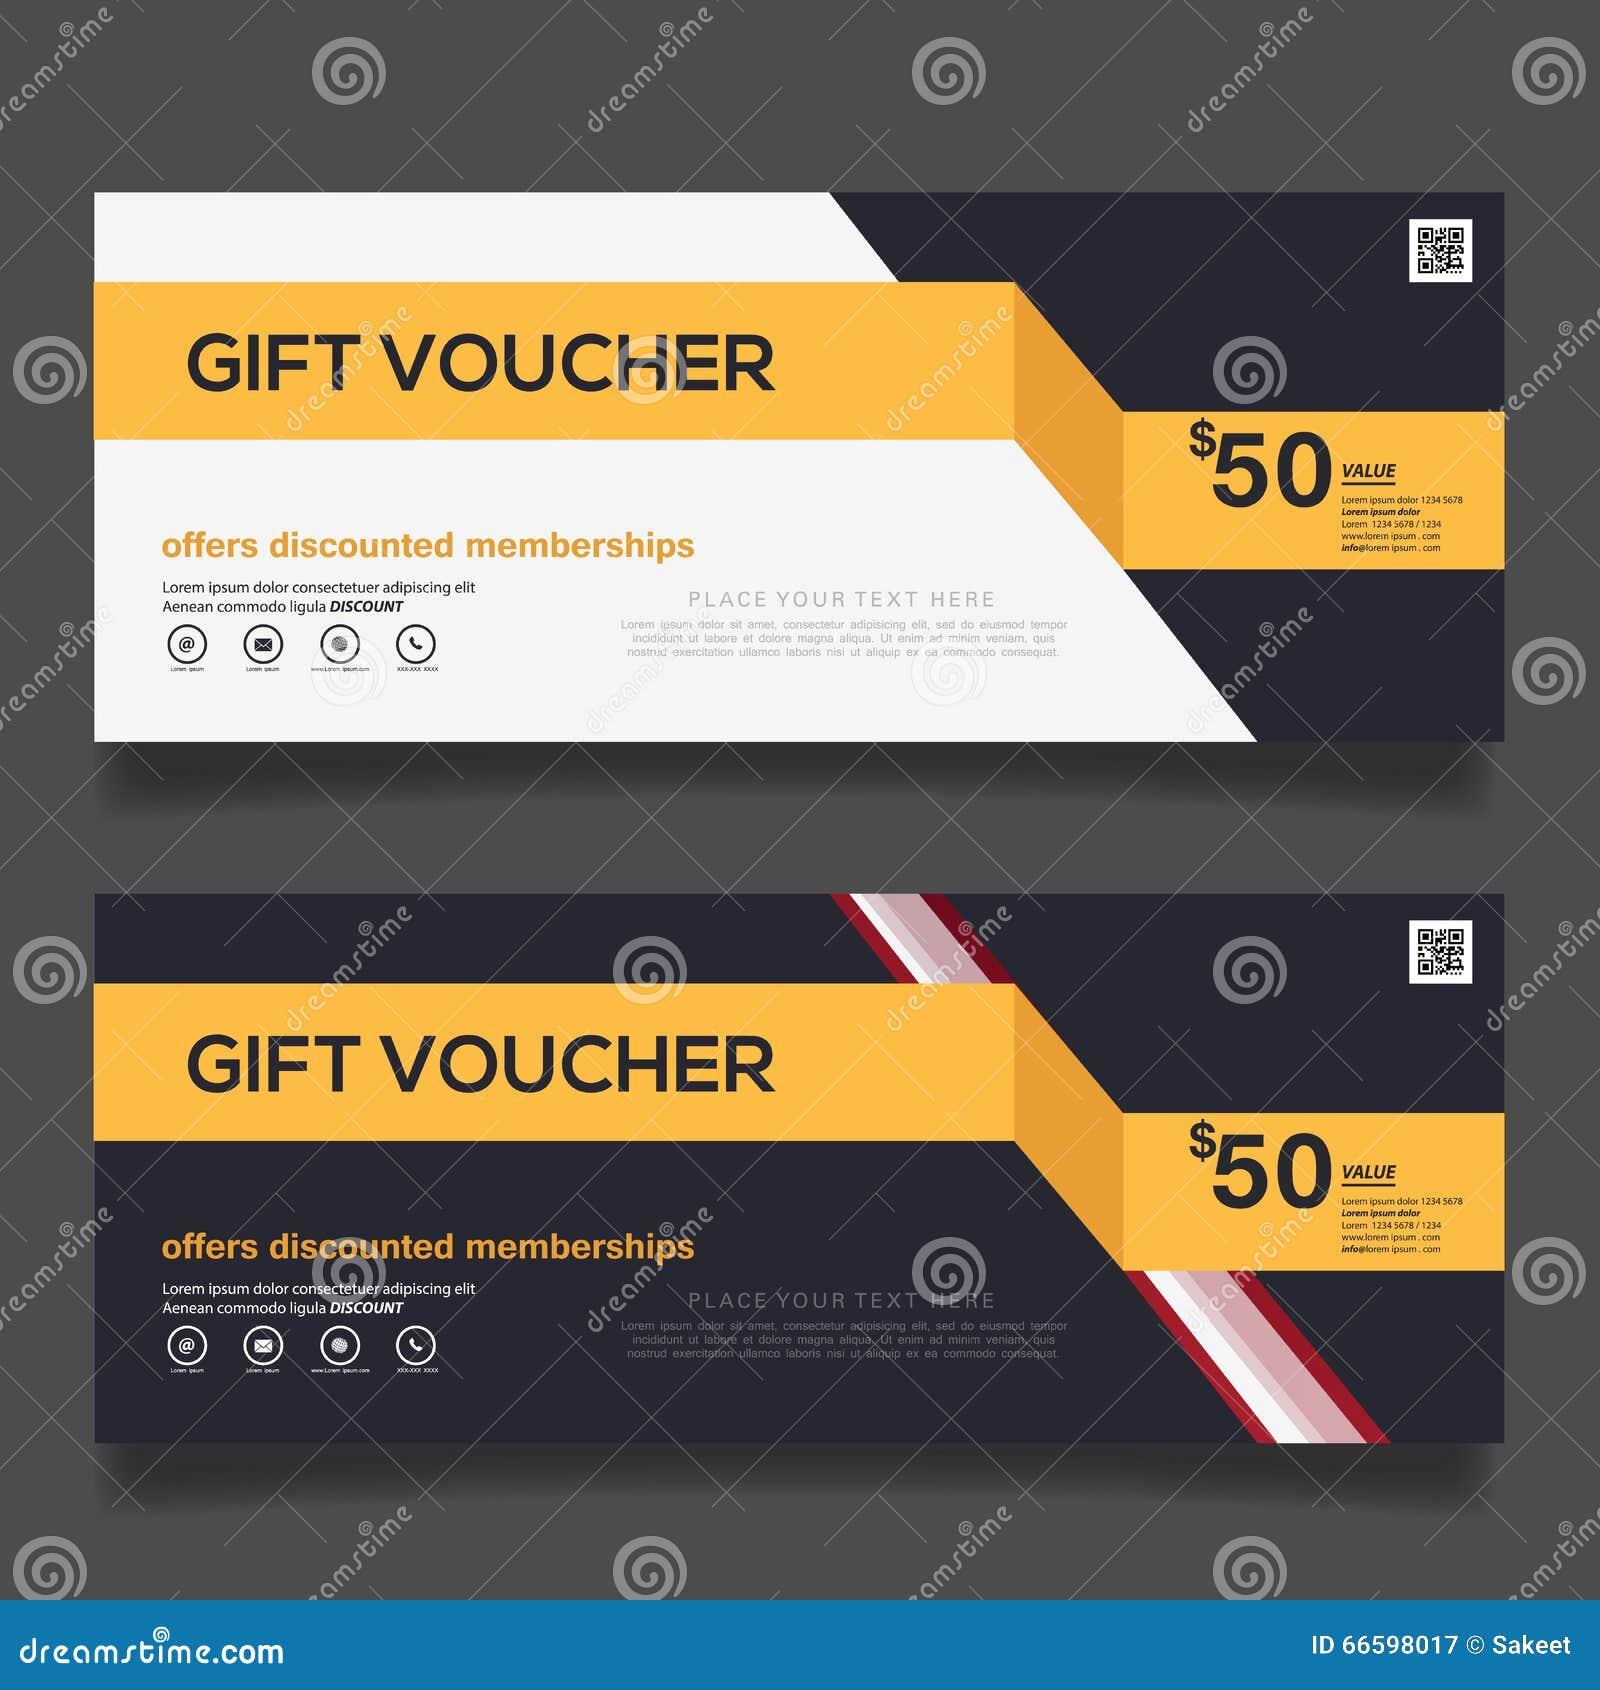 Gift Voucher Design Vector Template Stock Vector - Image ...